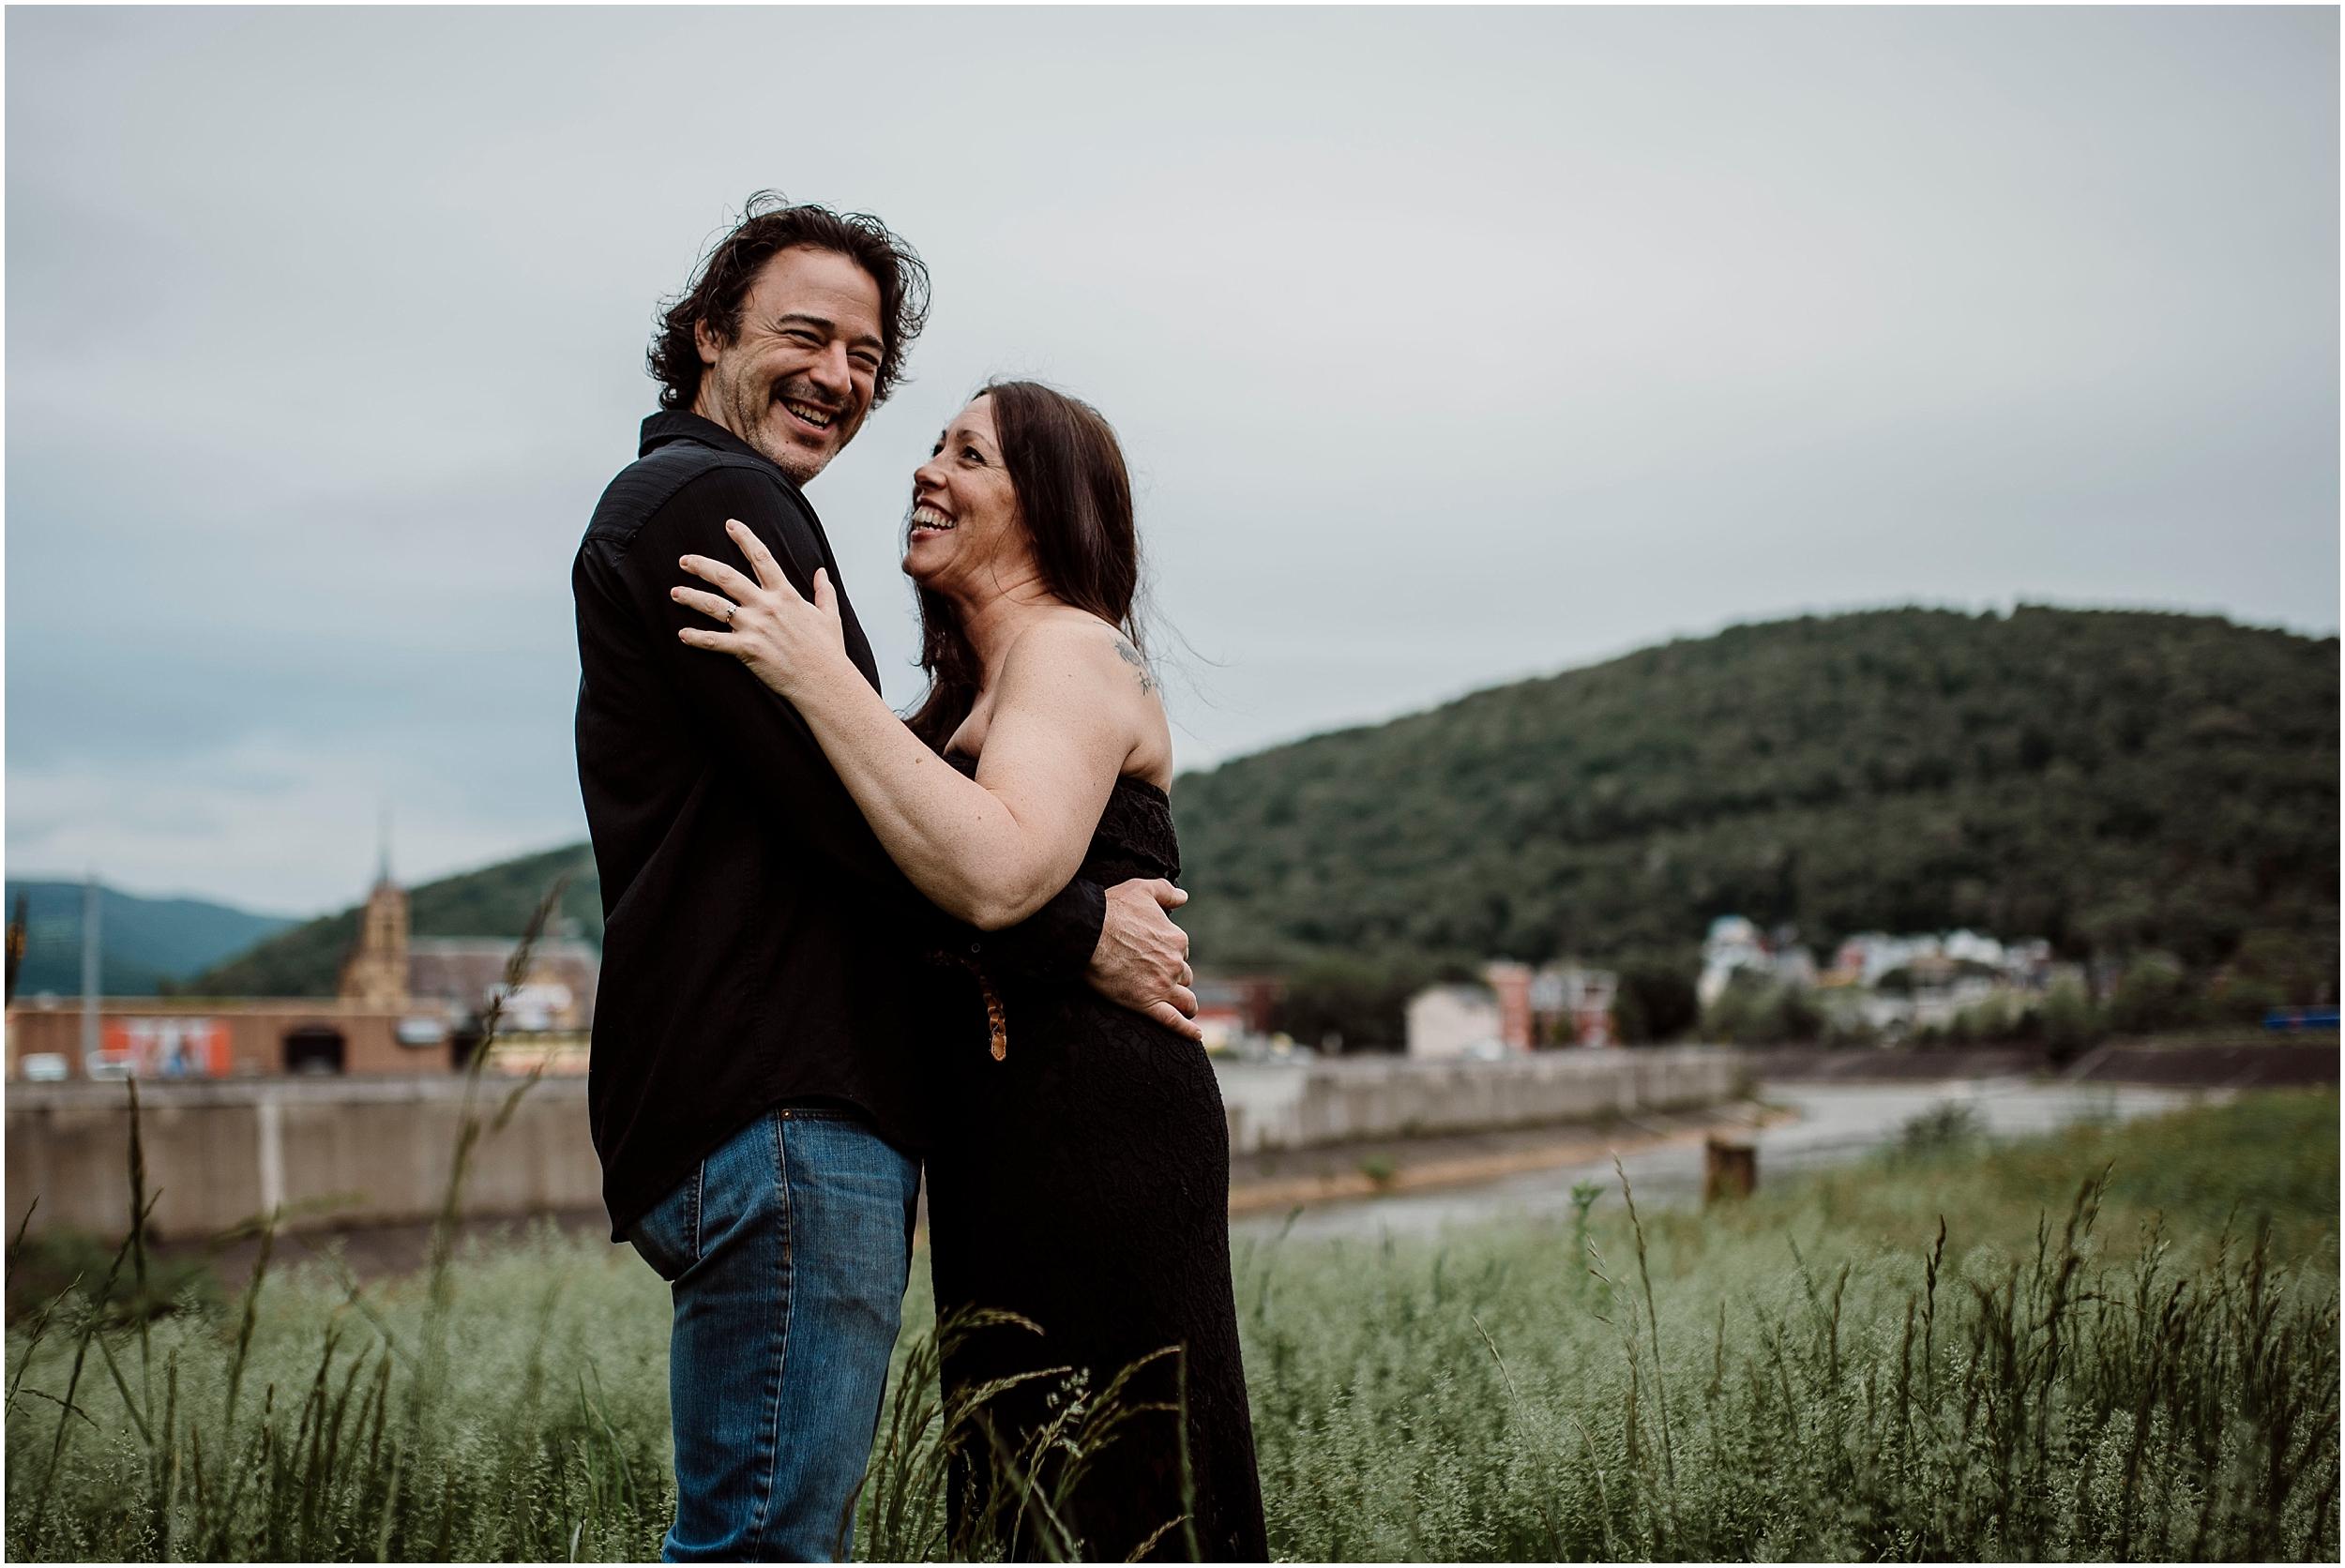 Pittsburgh-wedding-photographer-sandrachile_0003.jpg